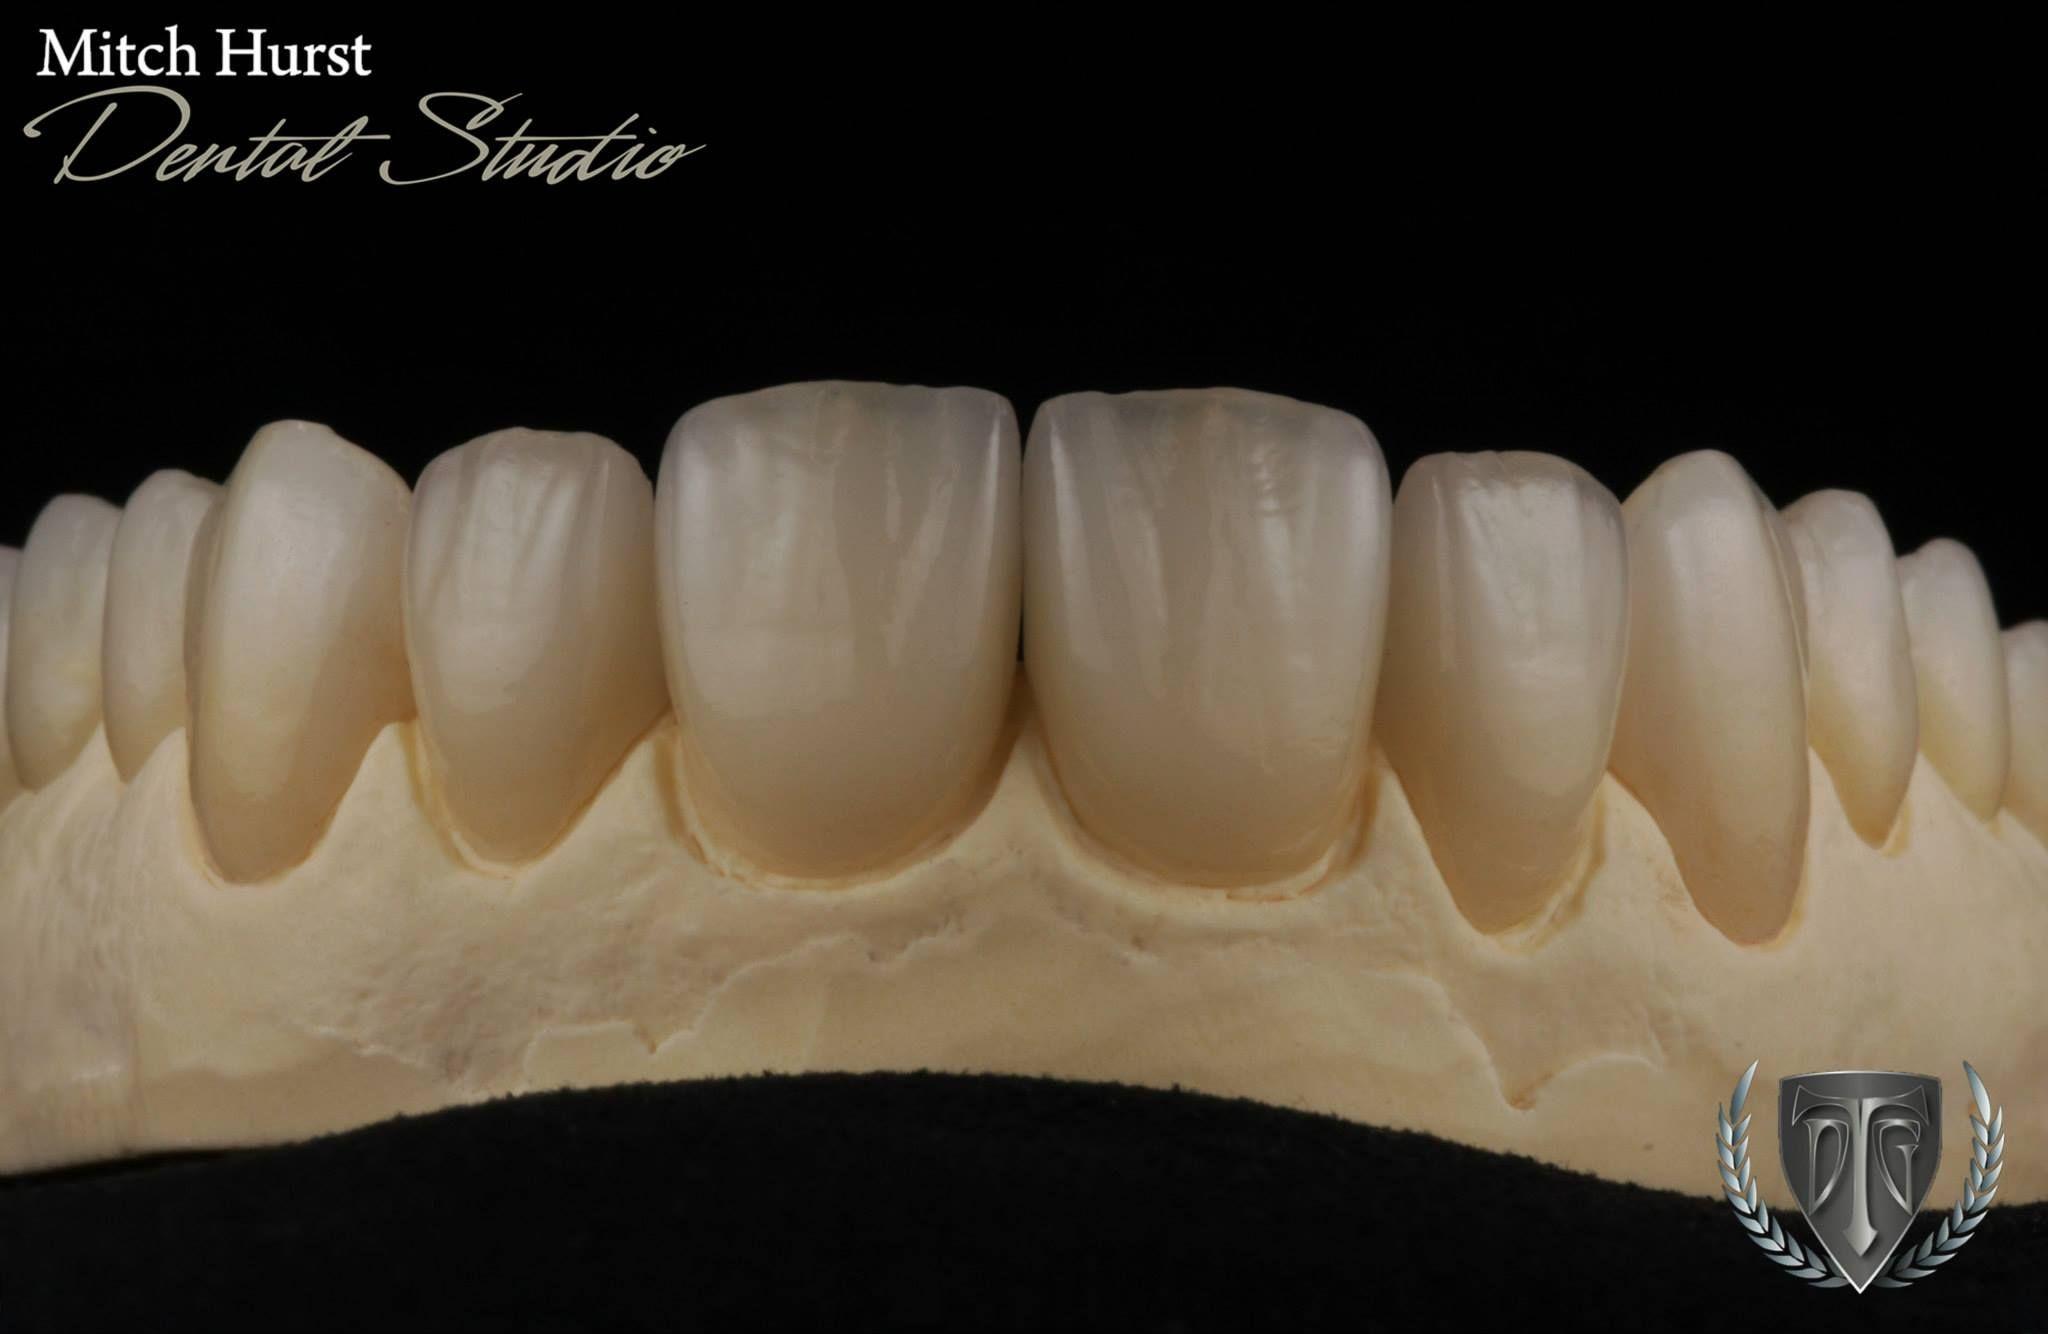 Dental Crowns Cosmetic Dentistry Beautiful Smile Ceramic Restoration Hurstdentalstudio Com Protese Dentaria Dentes